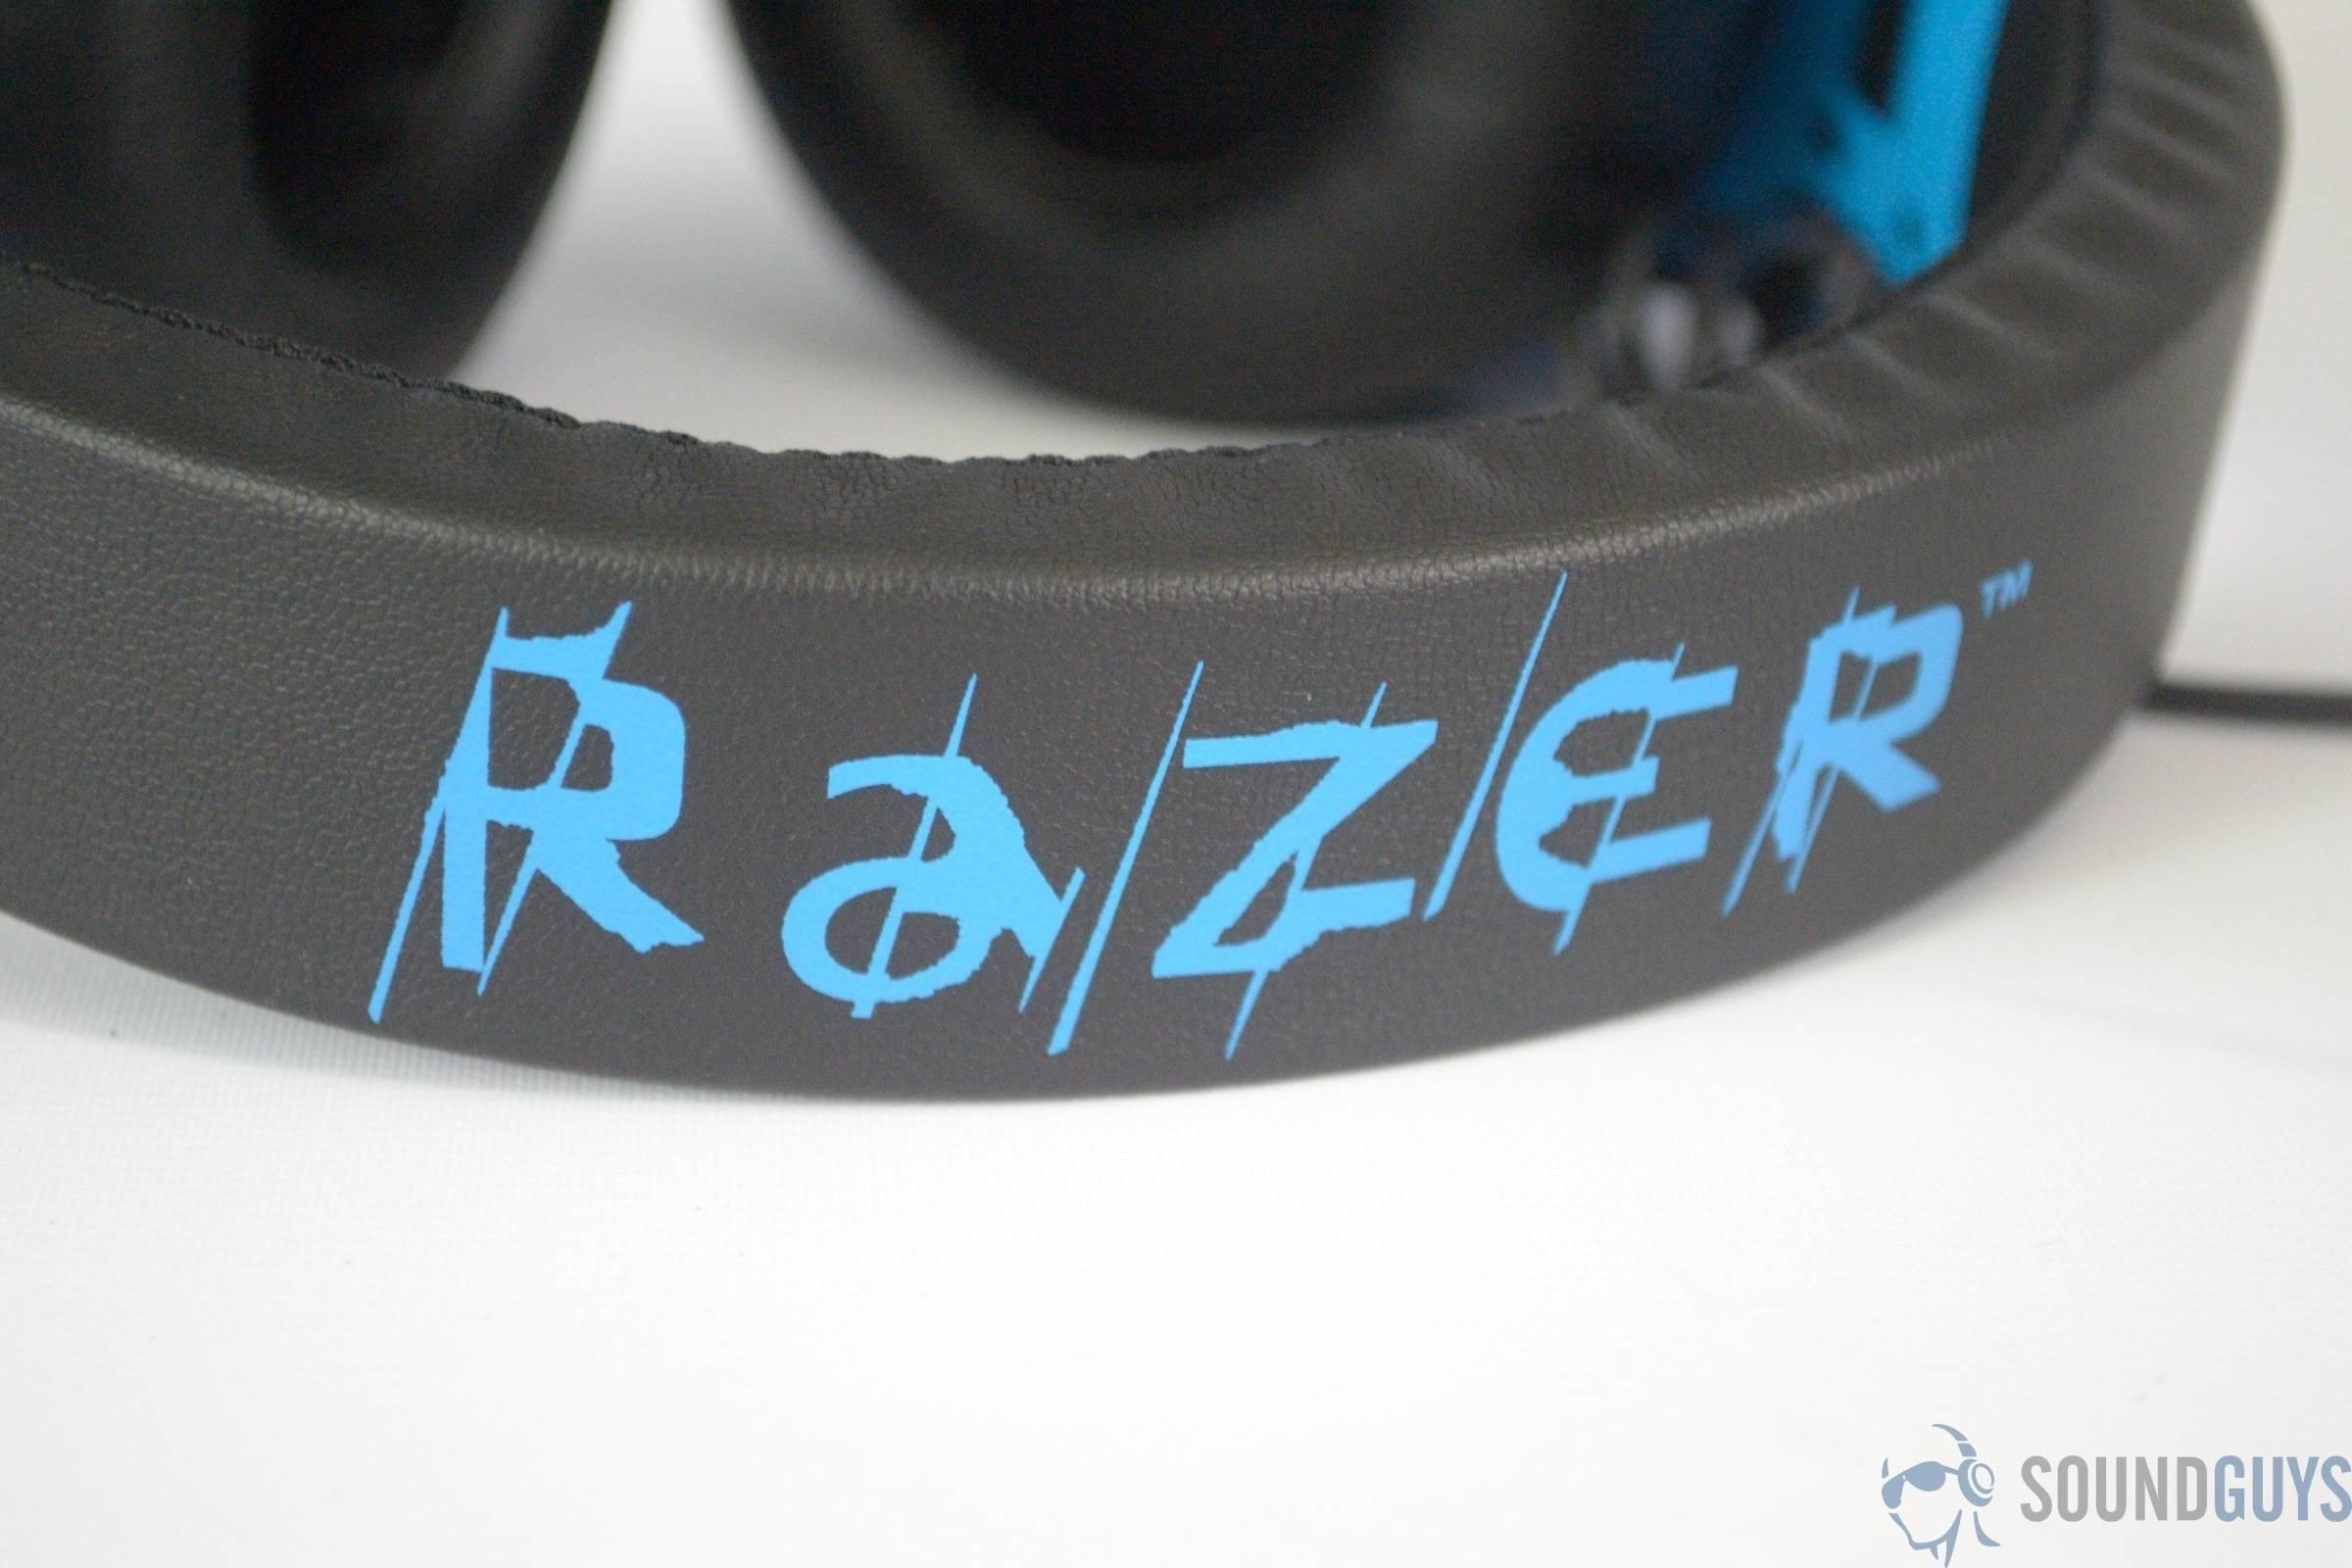 how to change the colors on a razer chroma kraken